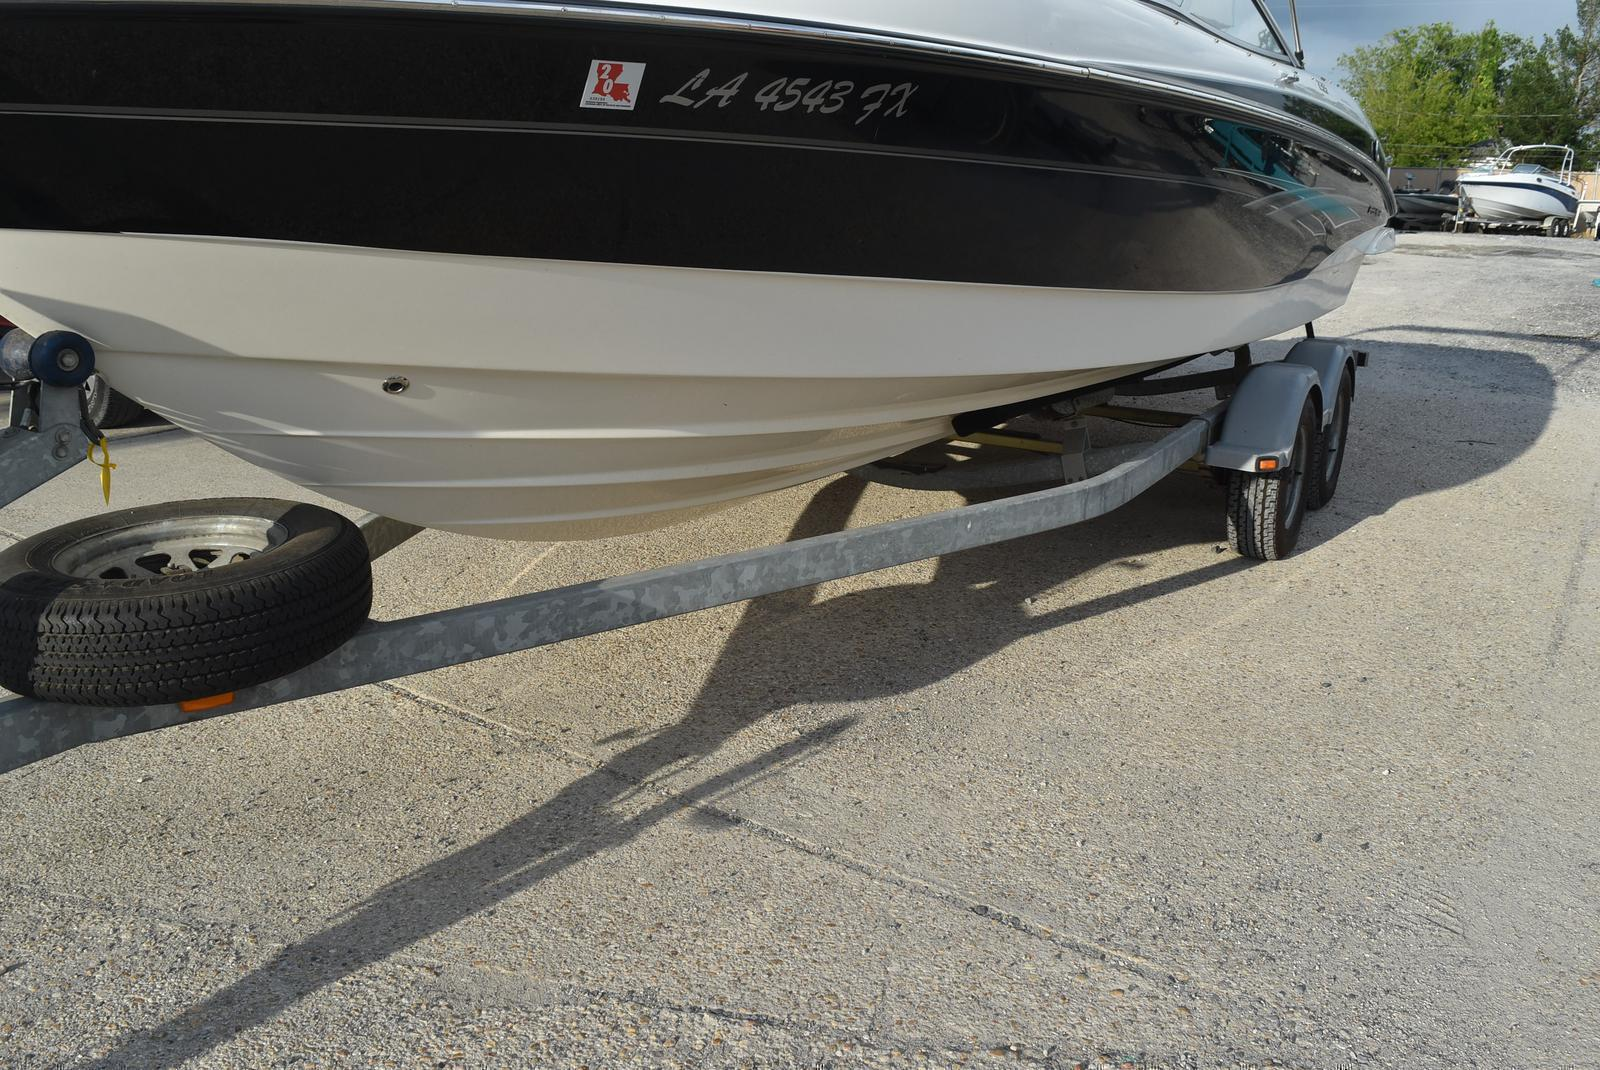 2010 Bayliner boat for sale, model of the boat is 235BR & Image # 36 of 43